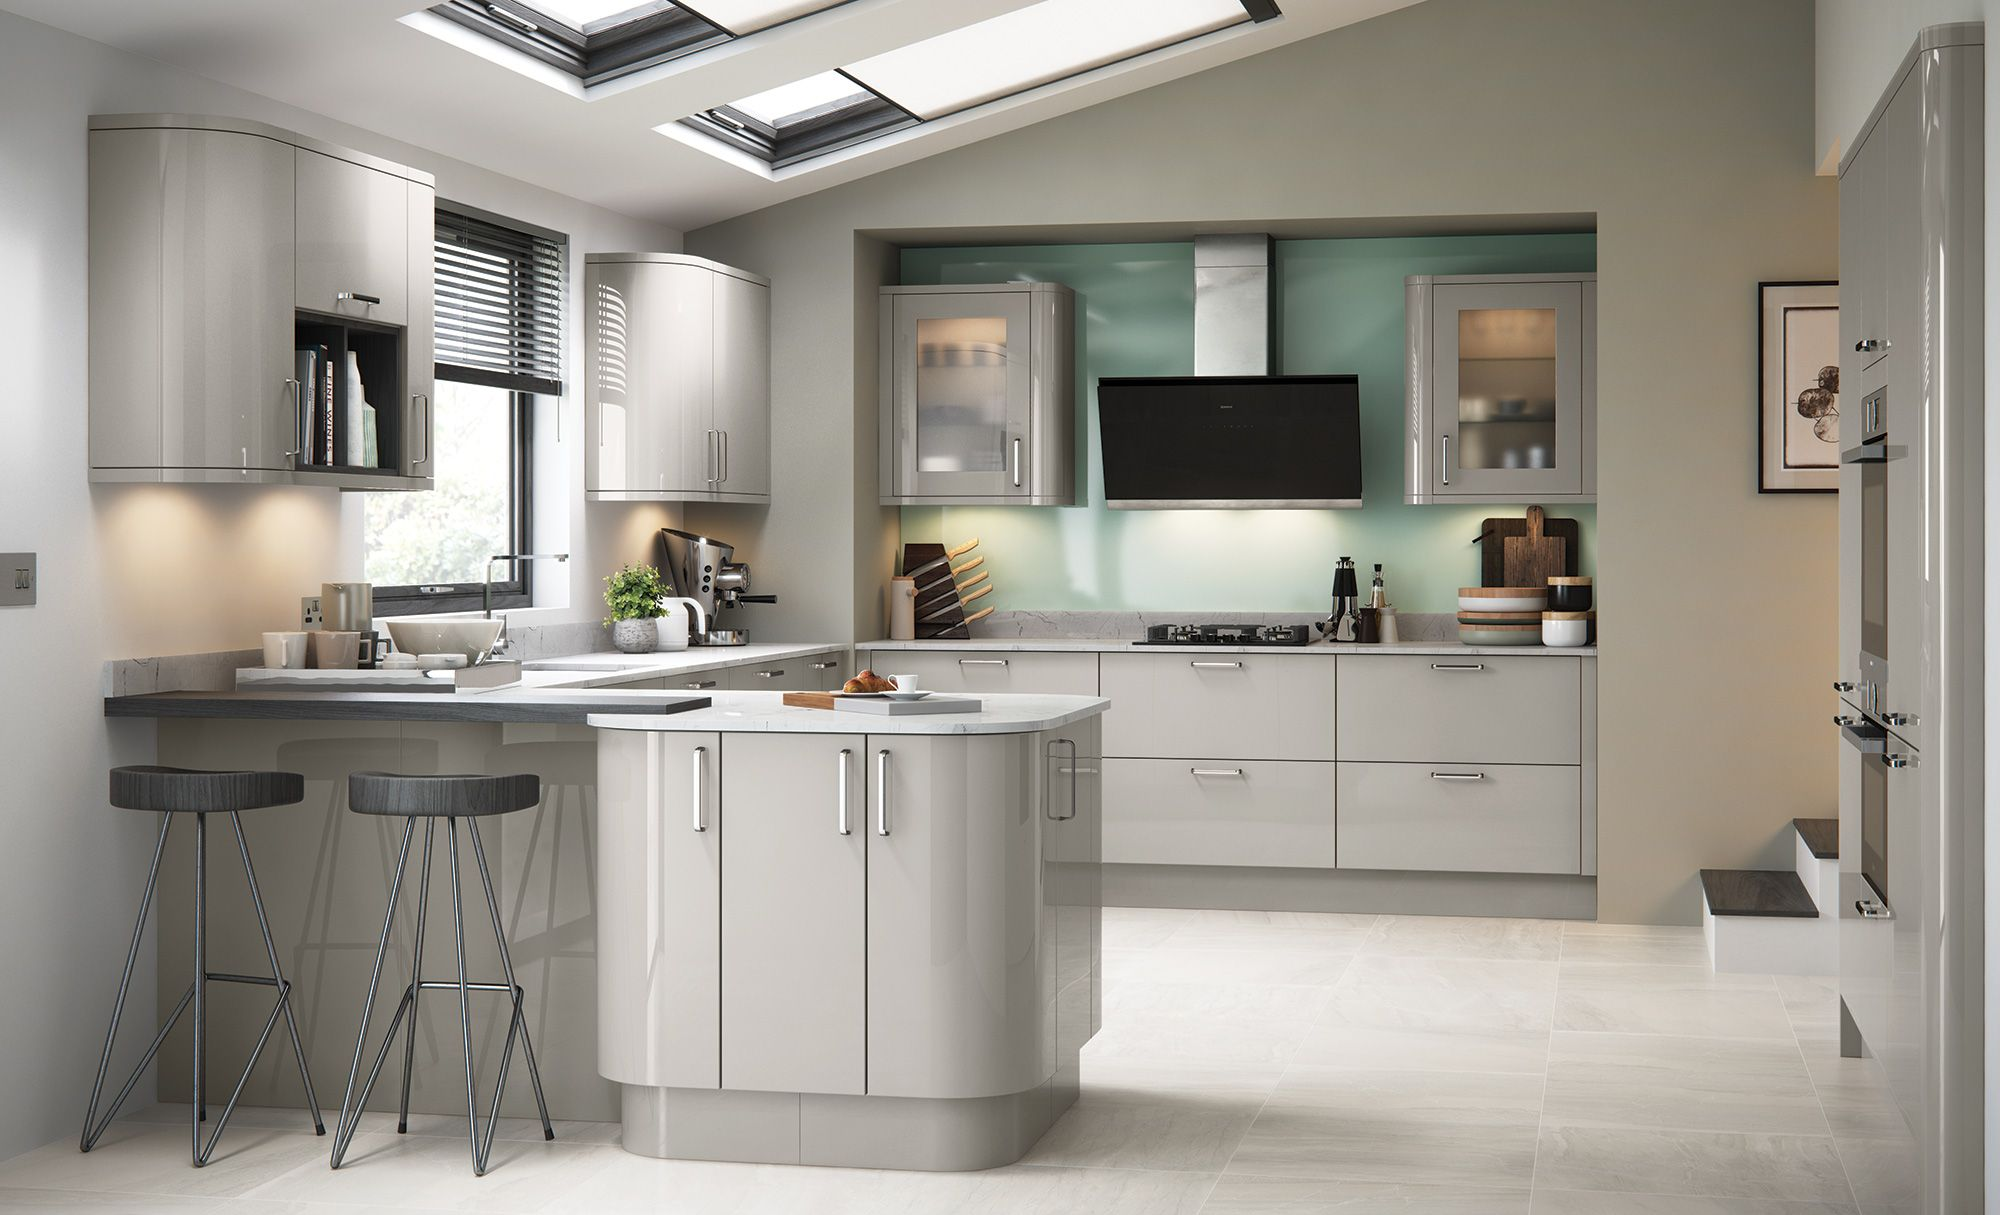 Inspiration for Kitchen designs in Lincolnshire Design